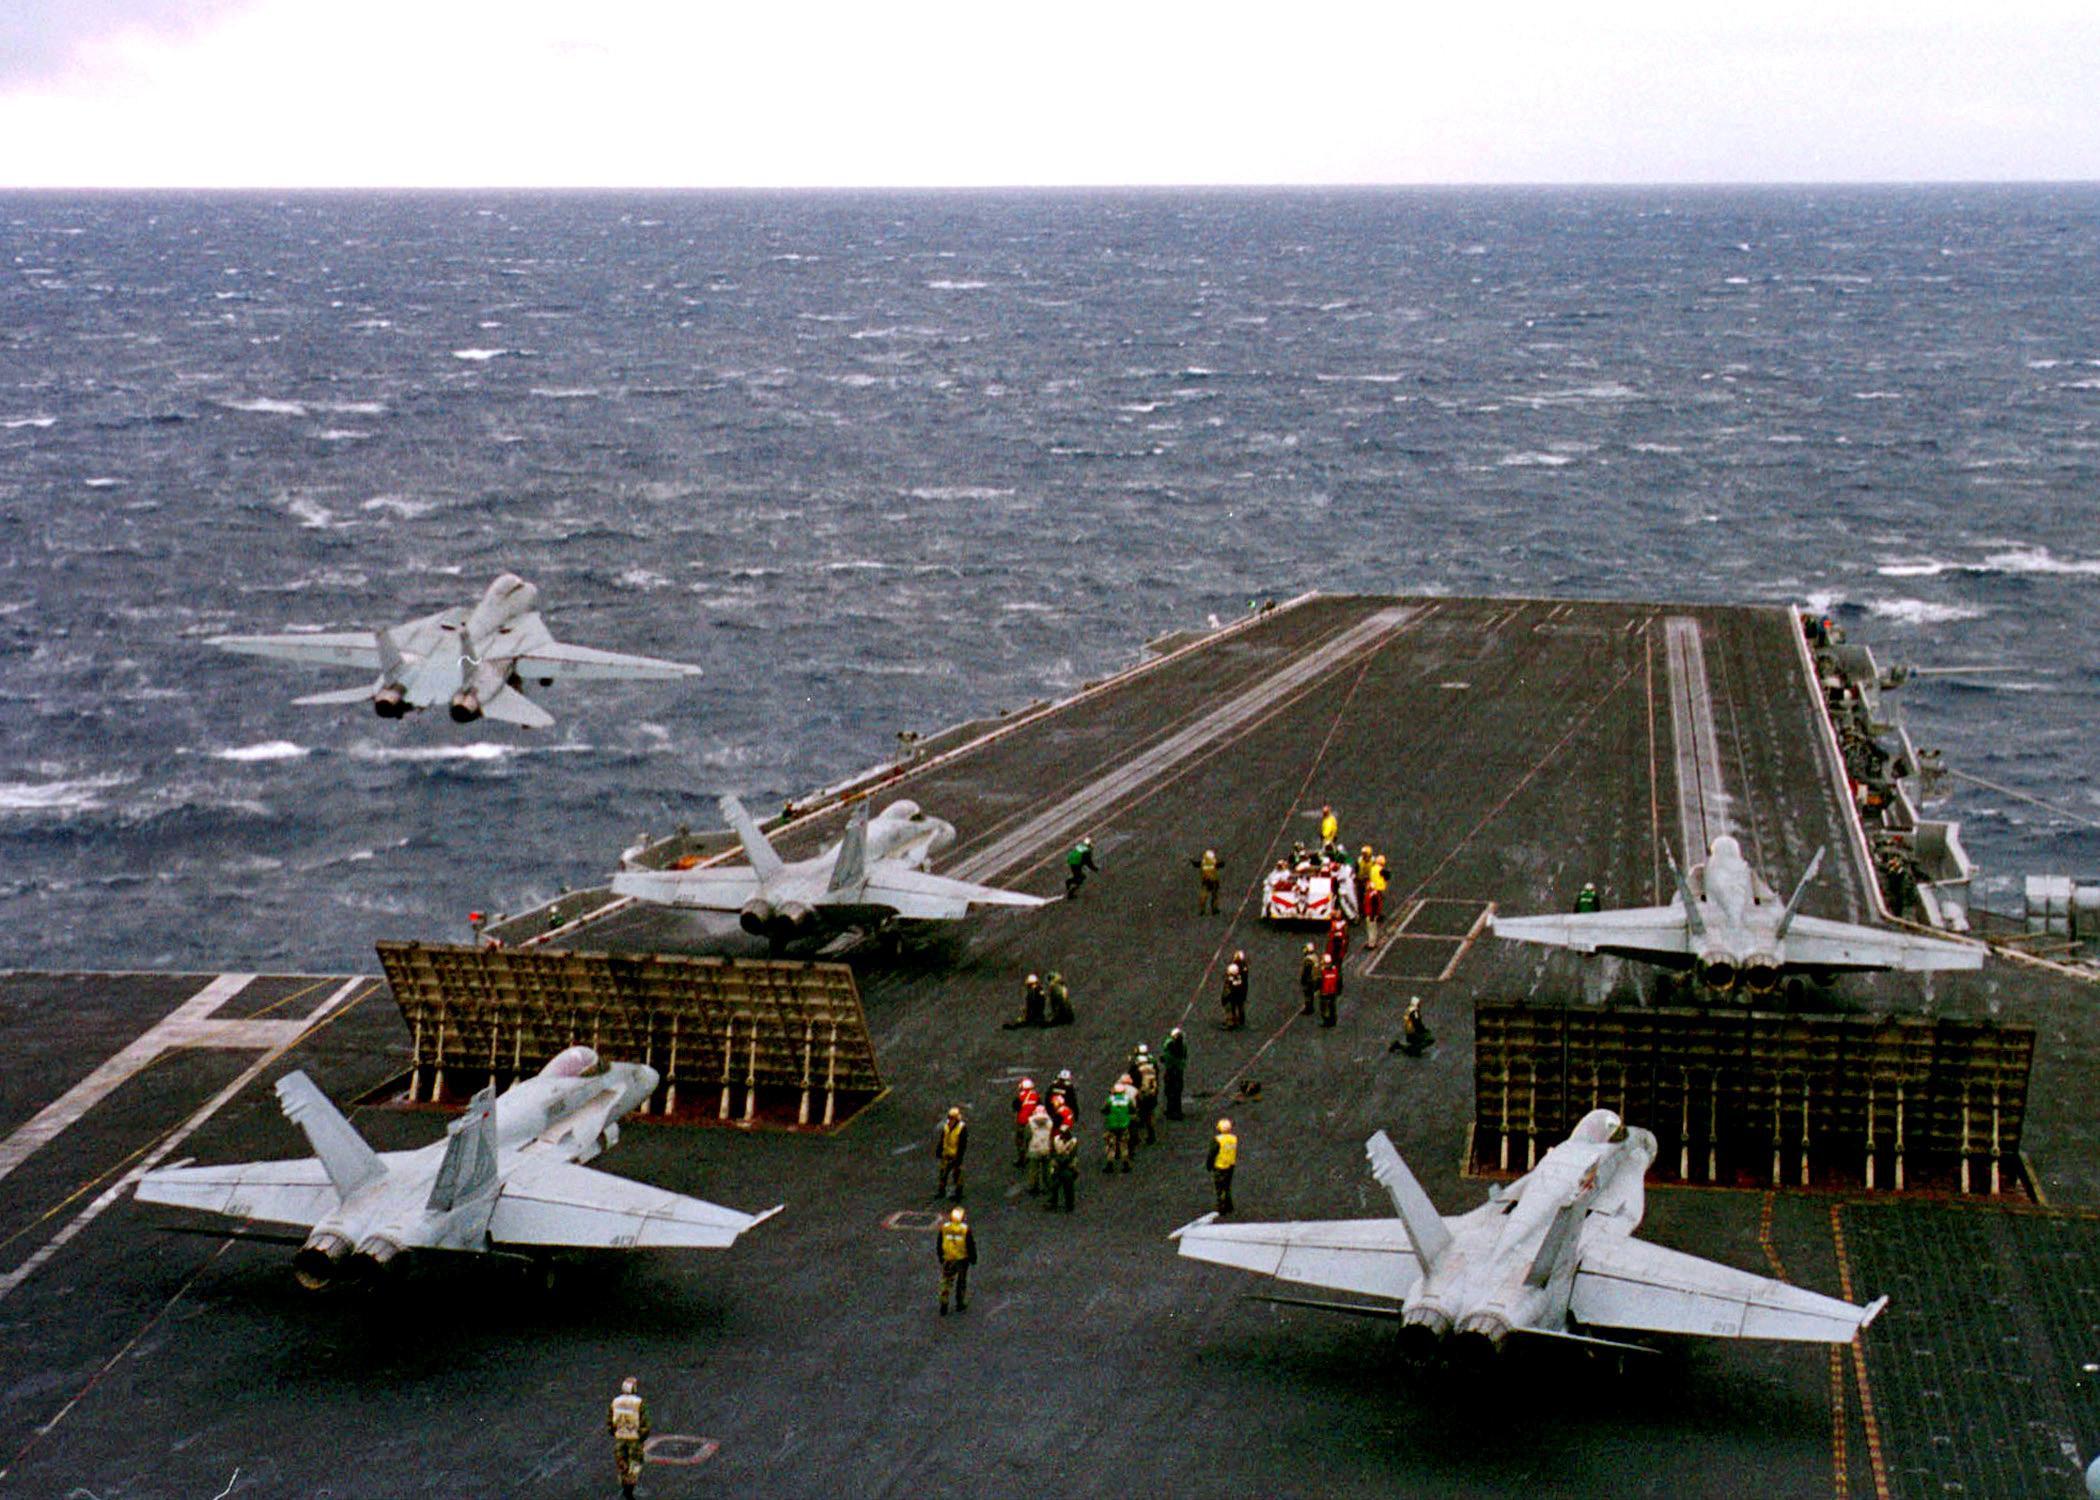 [_Navy,_1999_(DOD_Photo_990223-N-4004O-002)_(290190509)]